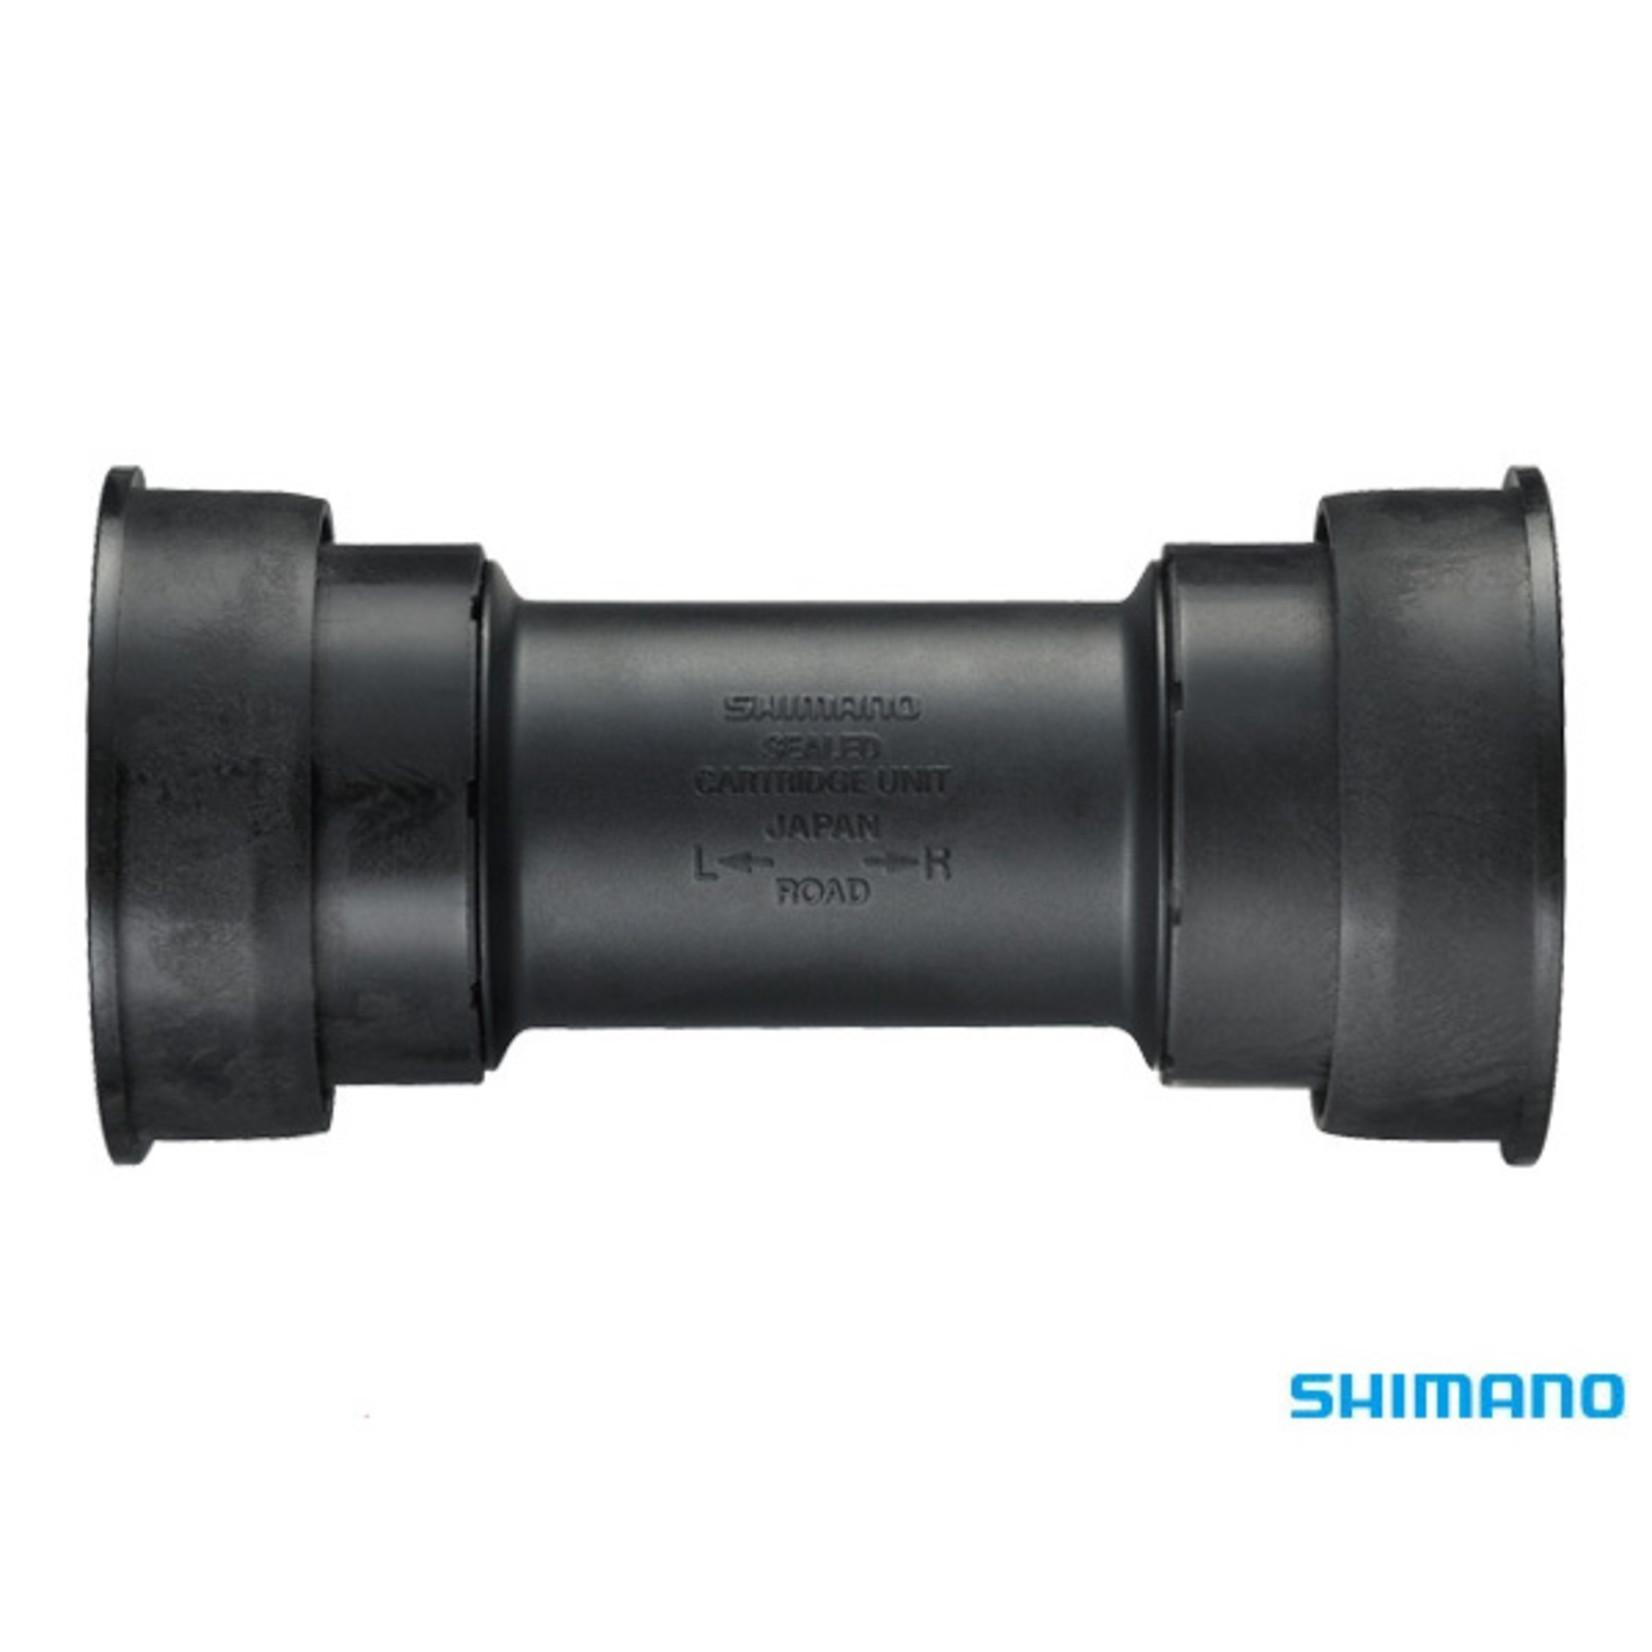 Shimano Shimano, SM-BB92 Bottom Bracket Dura-Ace Press-Fit 86.5mm 41mm Diameter